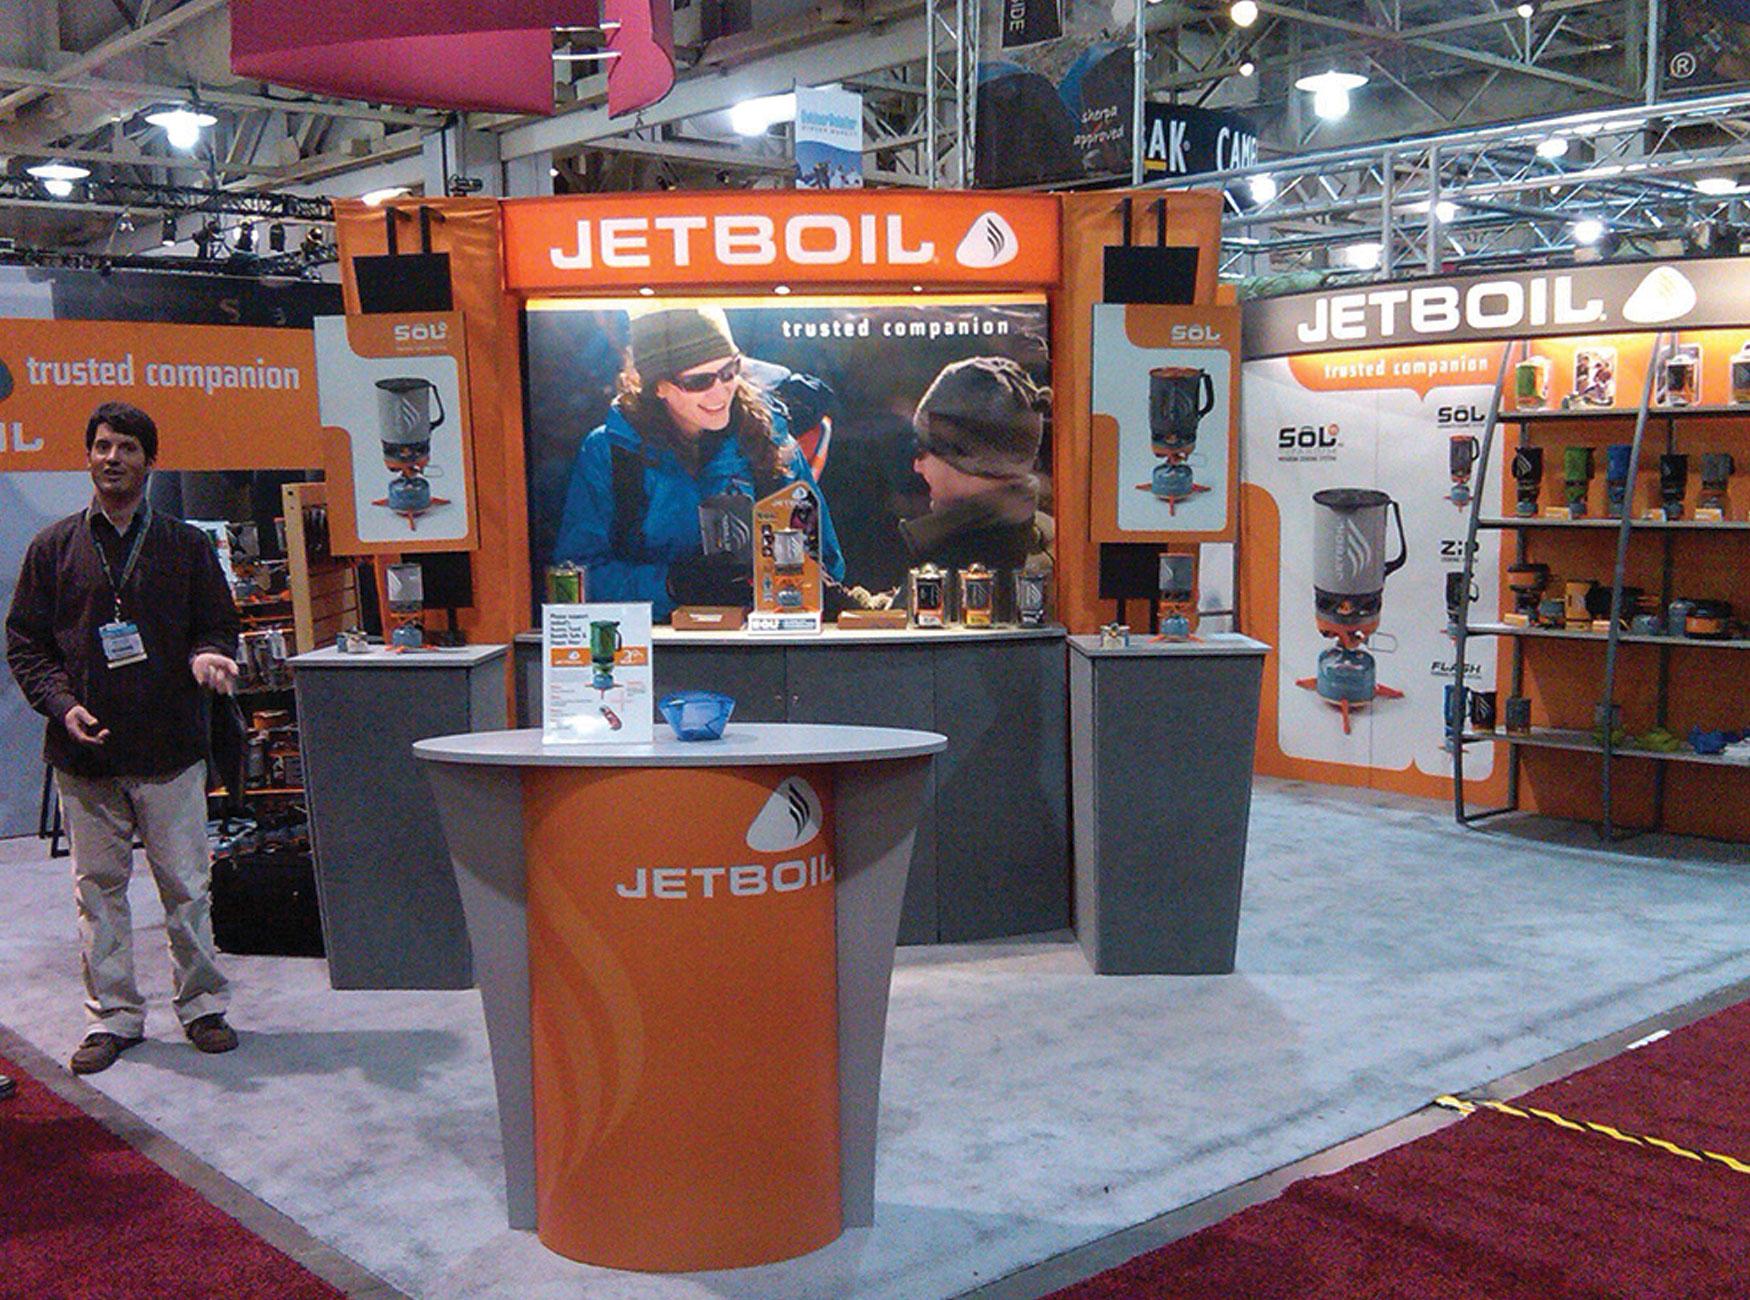 Jetboil1.jpg